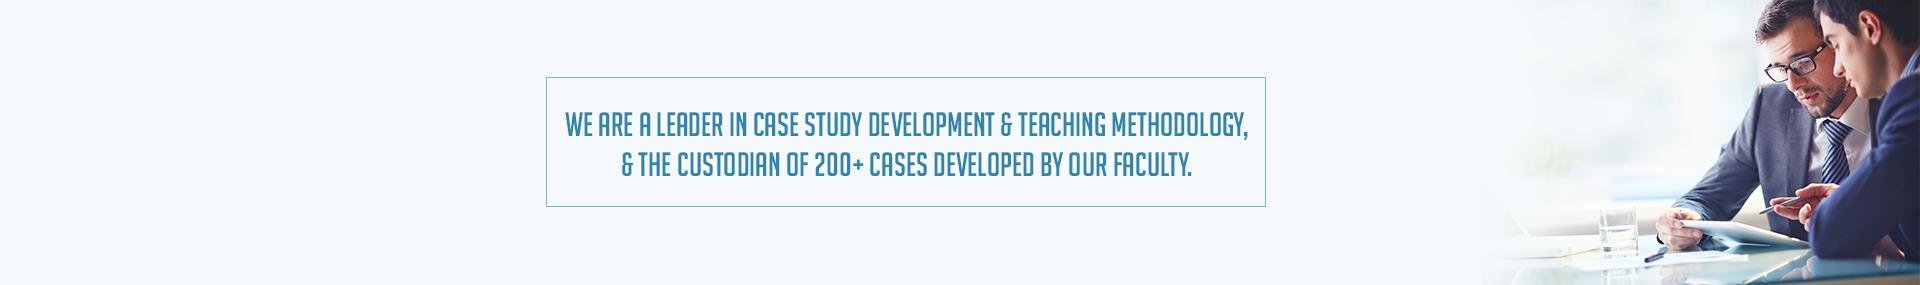 Teaching Methodology - ASM's IBMR